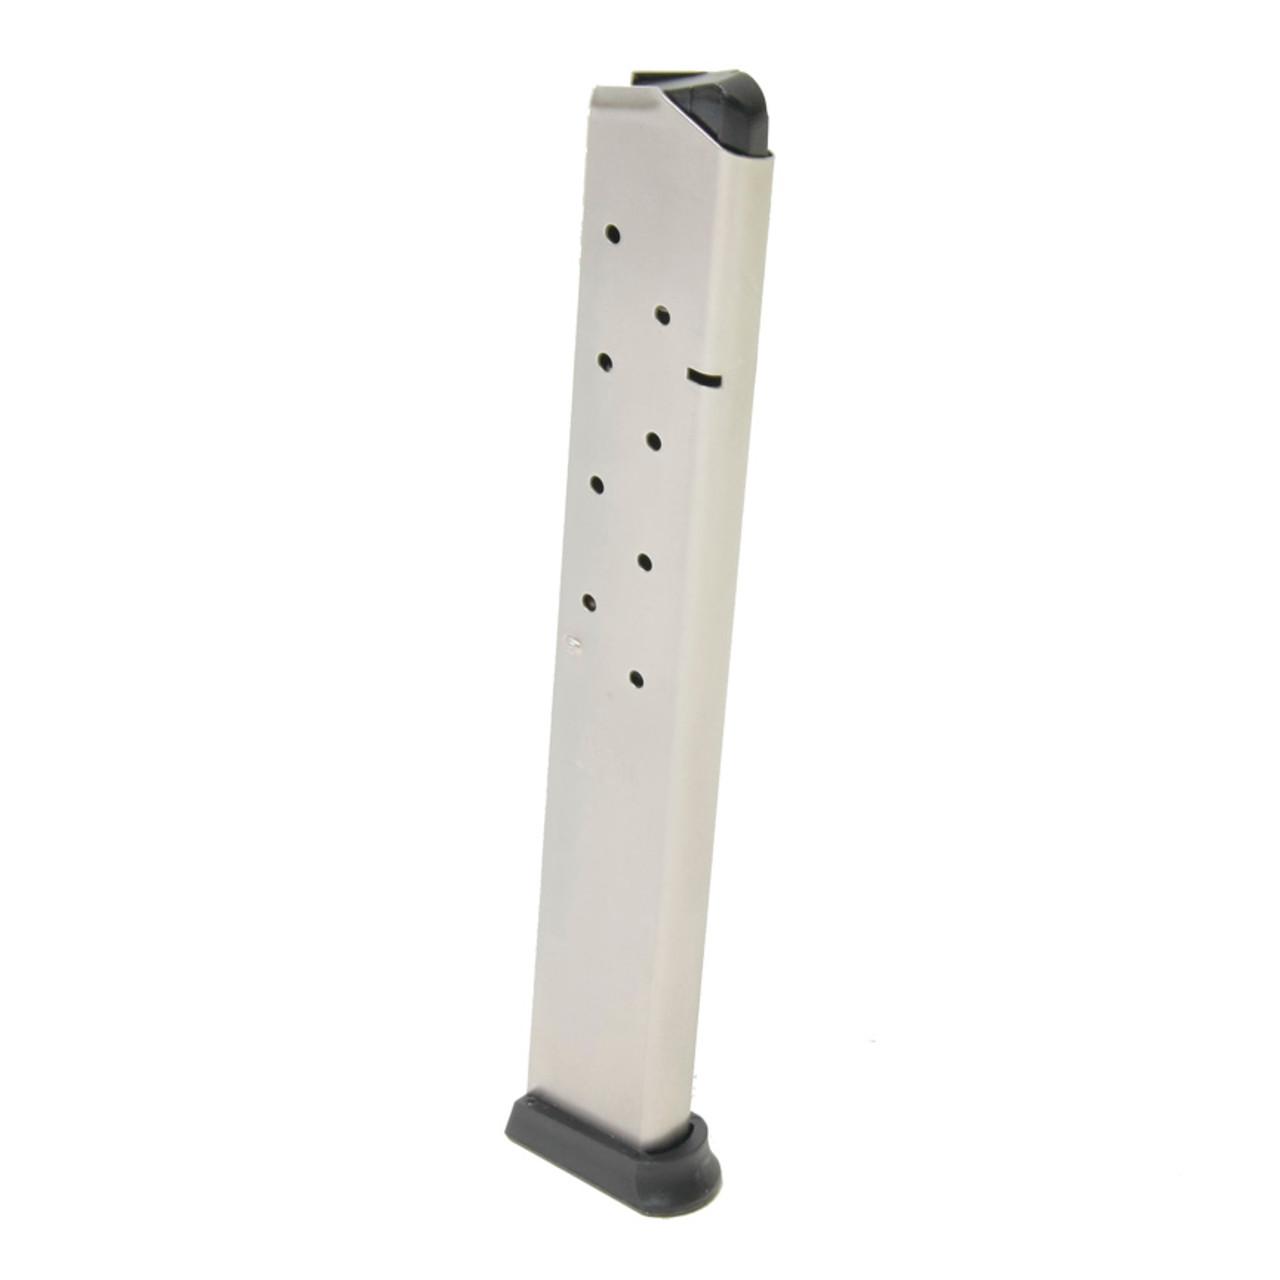 Ruger® P90 / P97 .45 ACP (15) Rd - Nickel Plated Steel